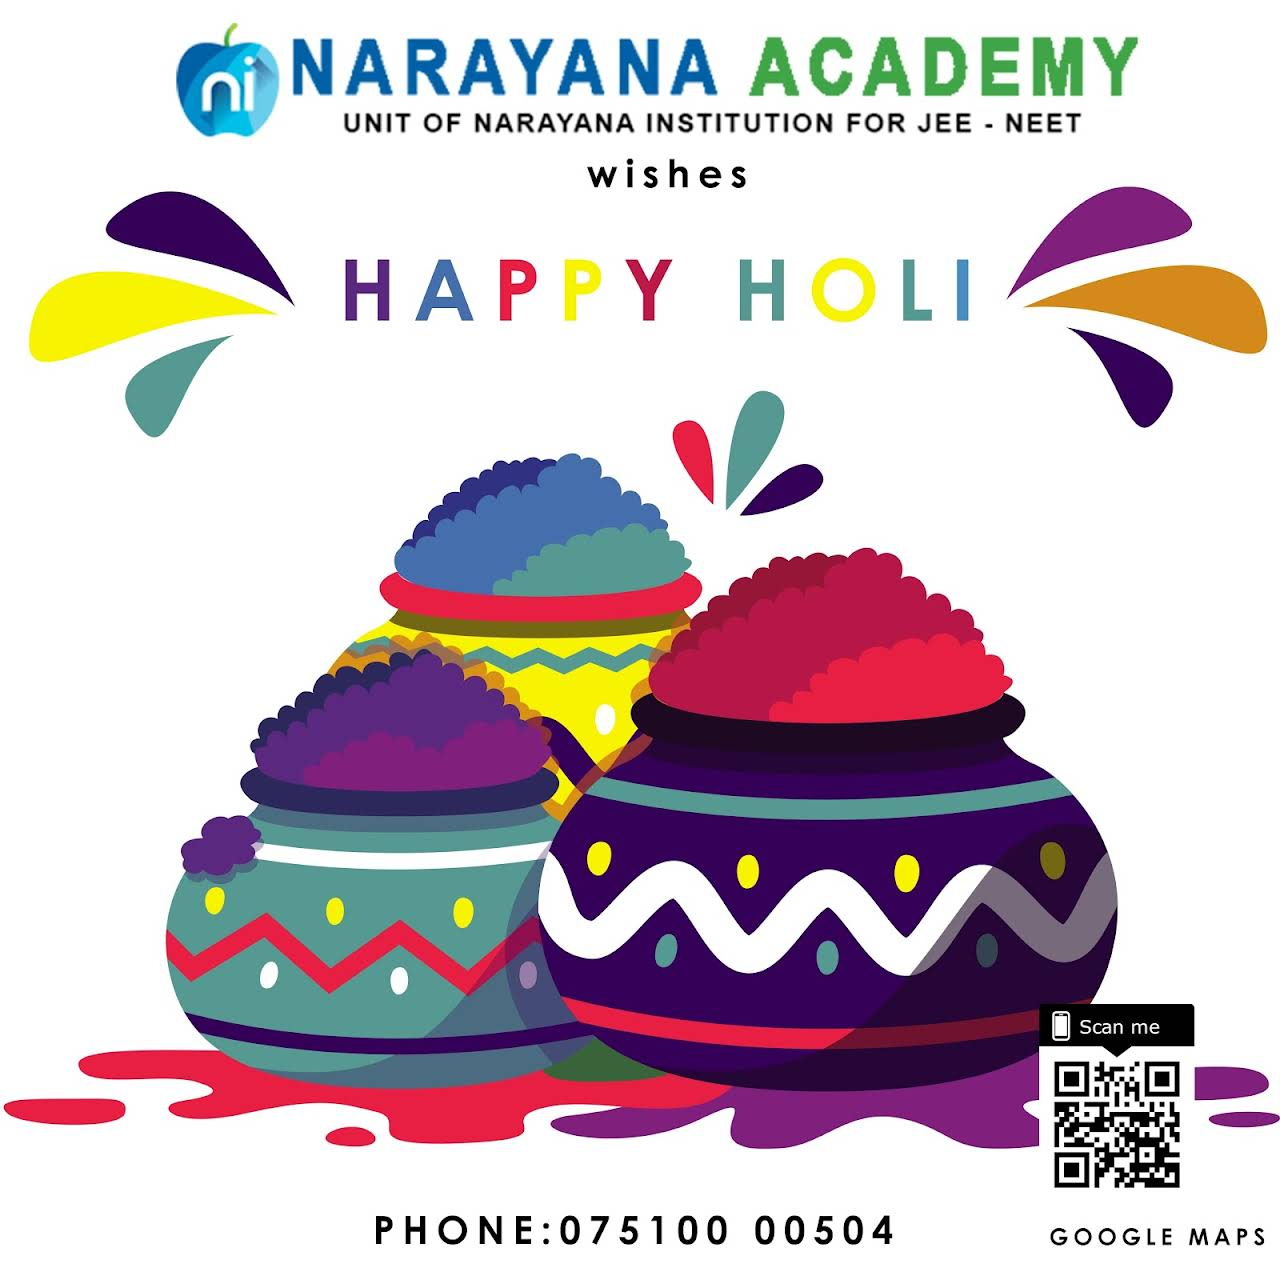 Narayana Academy - IIT Coaching Centre